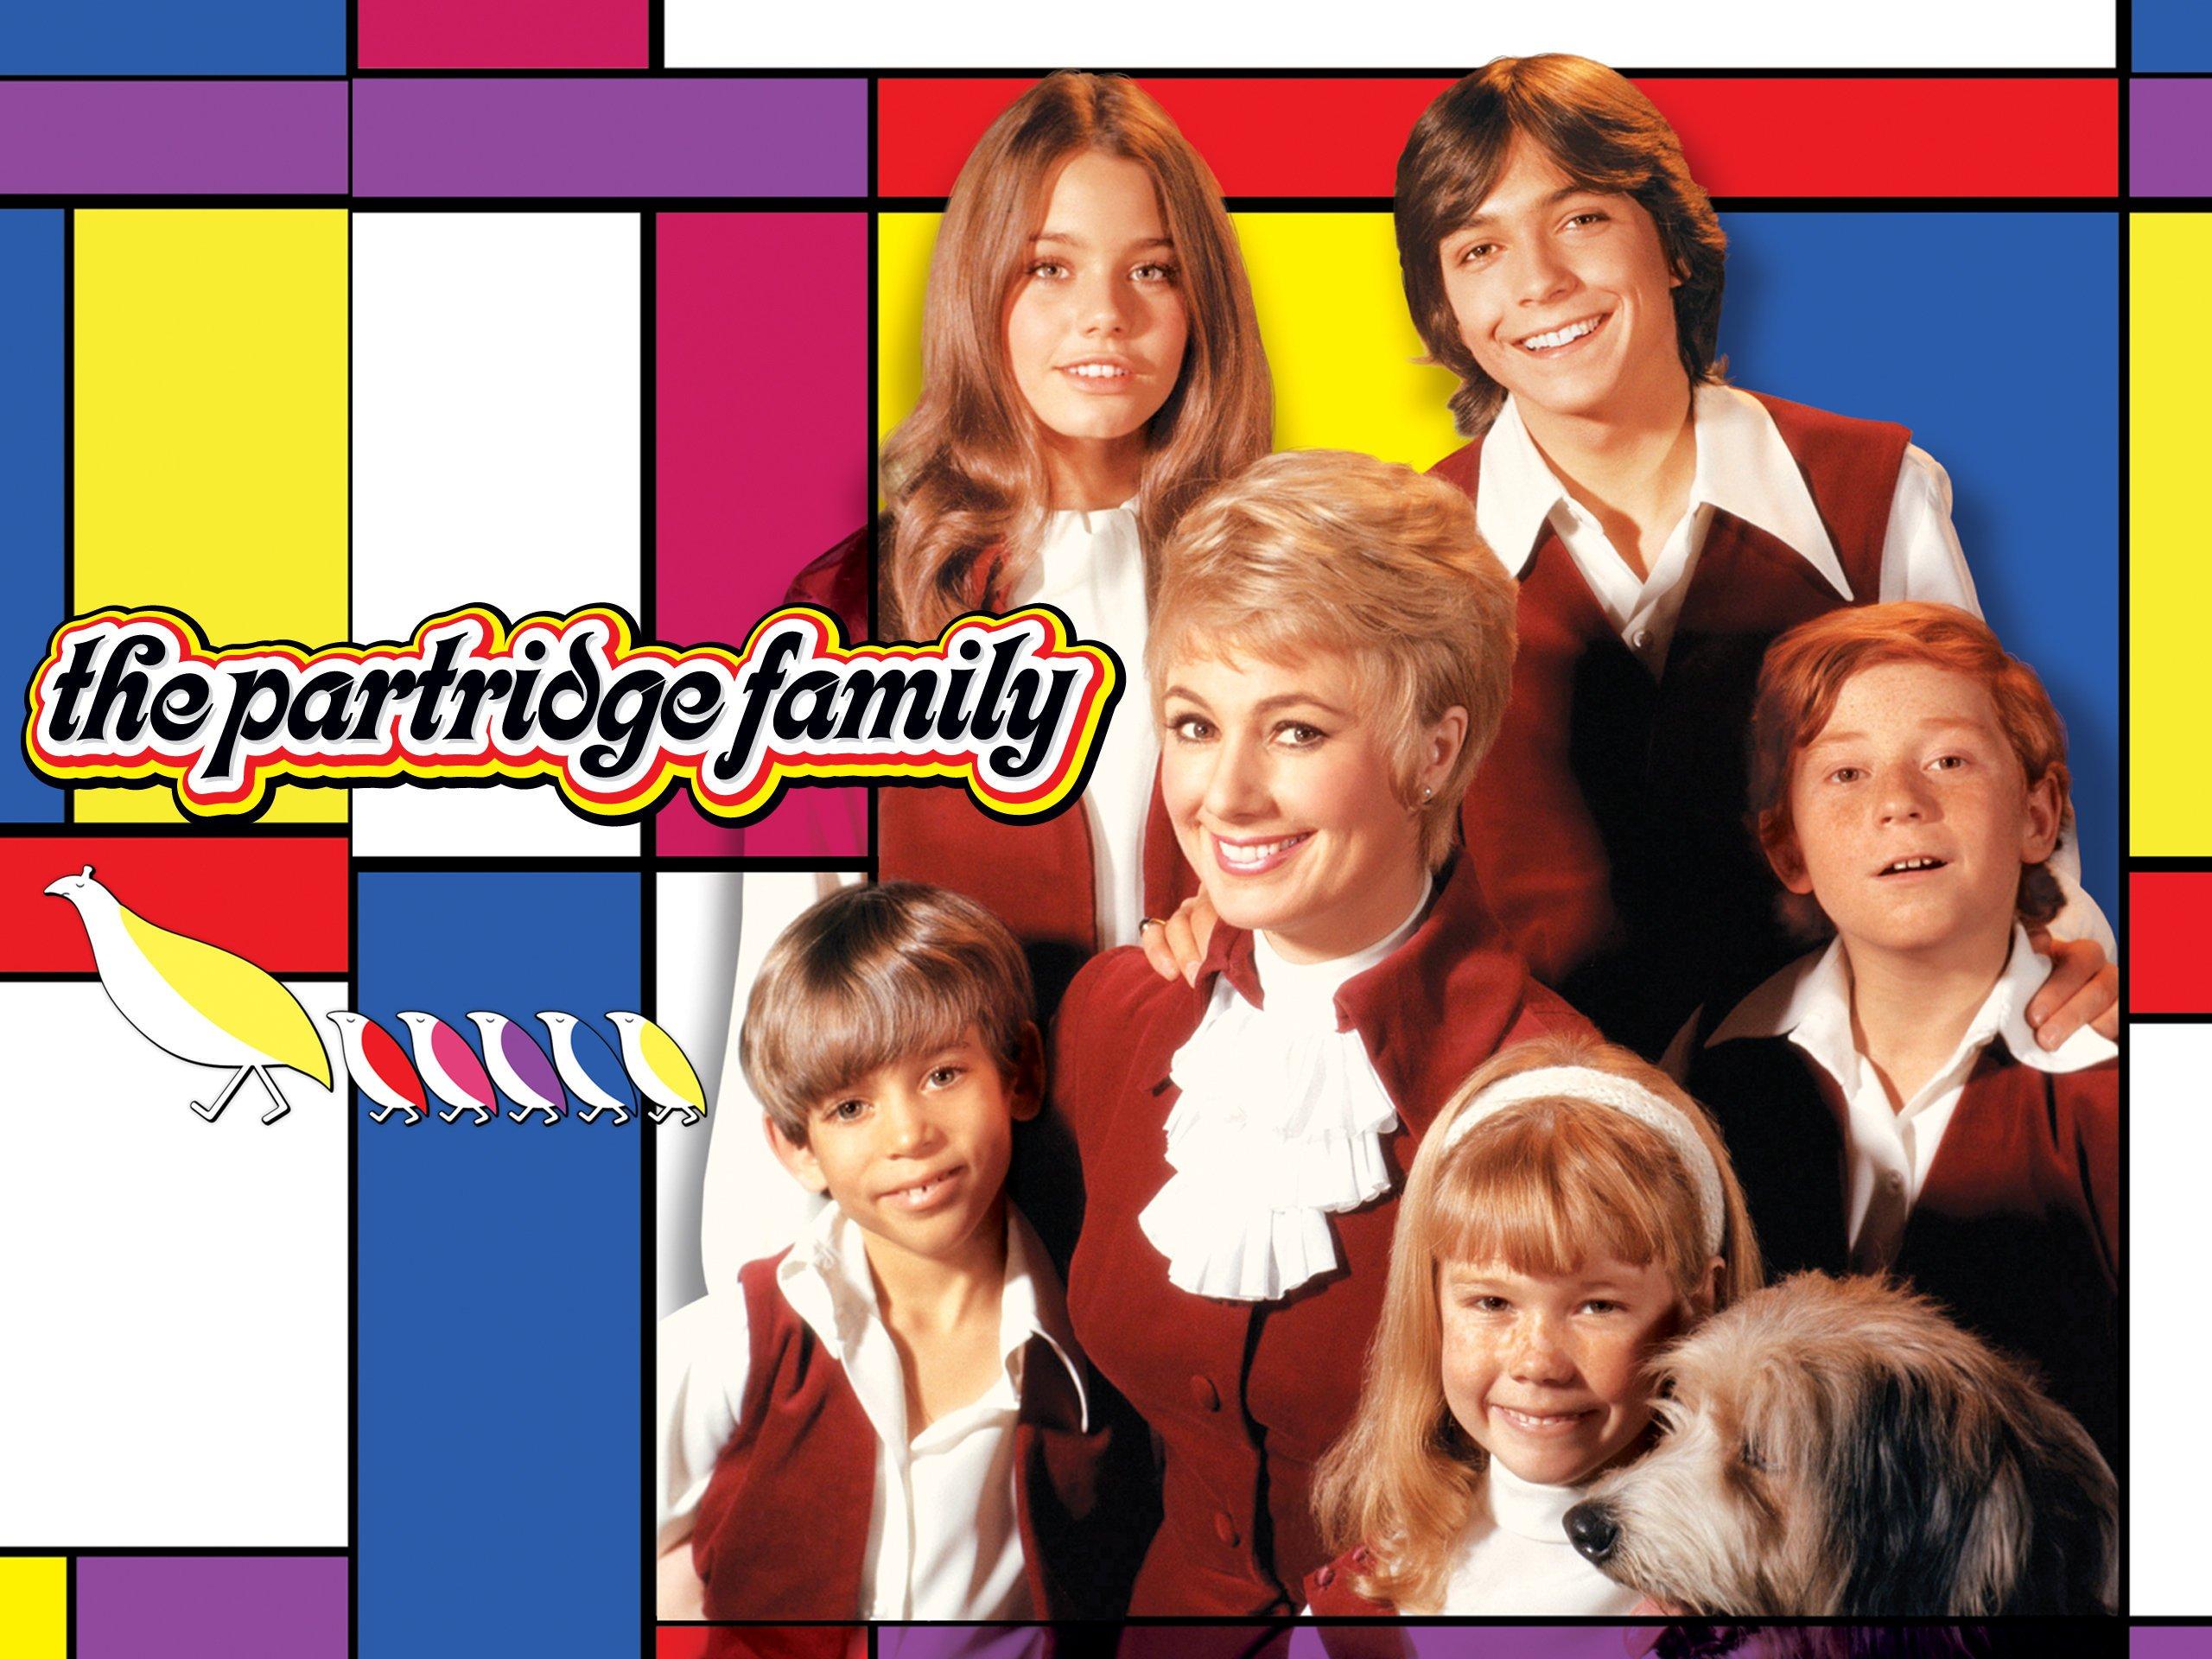 Amazon.com: Watch The Partridge Family Season 2 | Prime Video